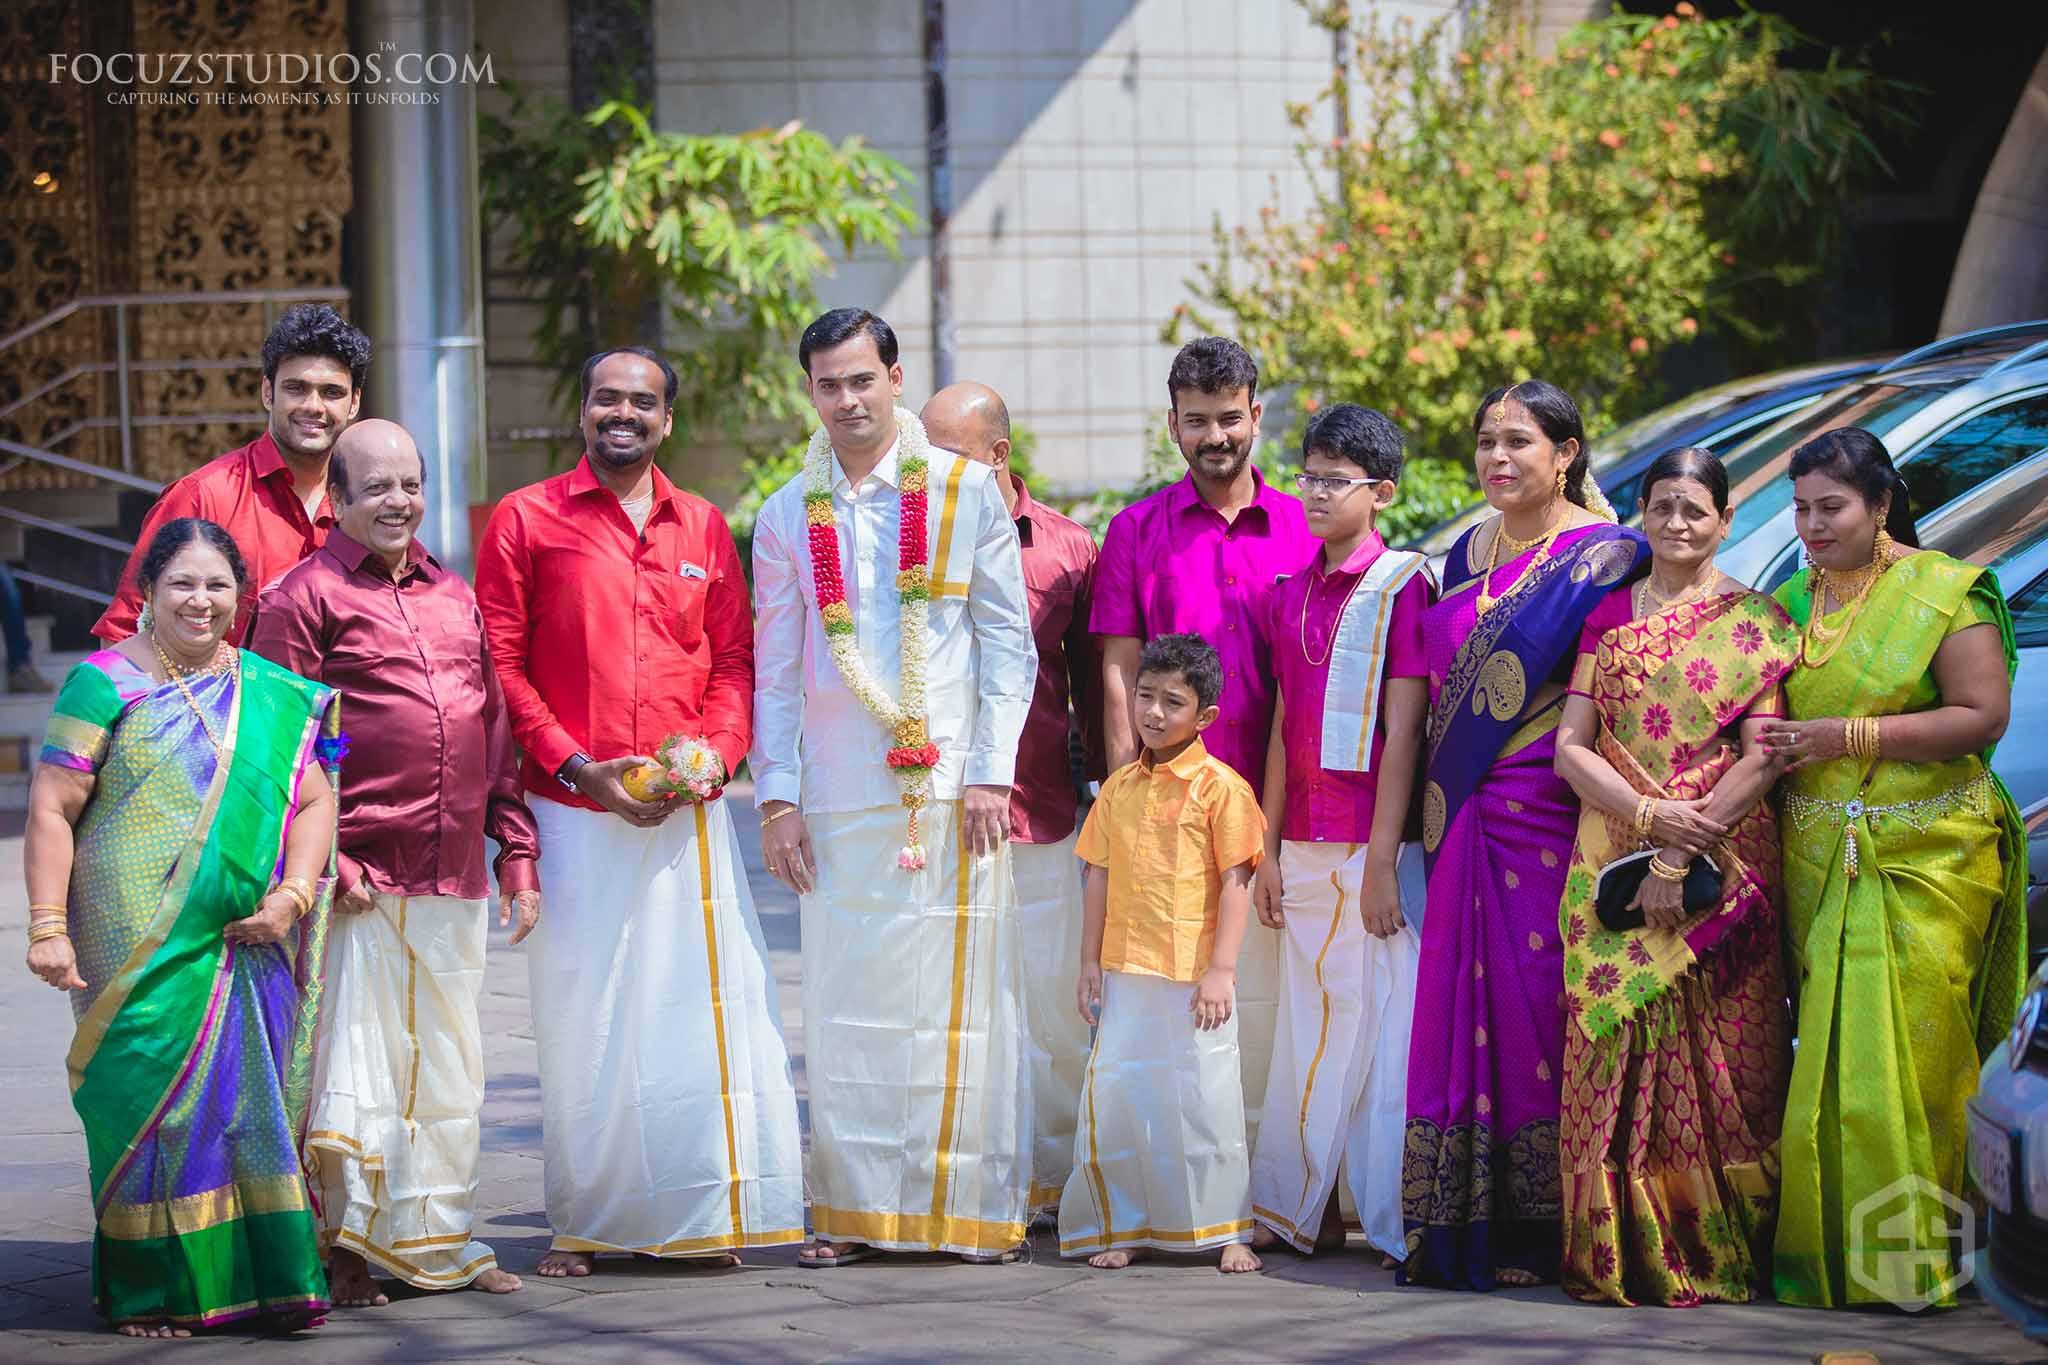 Candid-Photographers-in-Trichy-Tamilnadu11